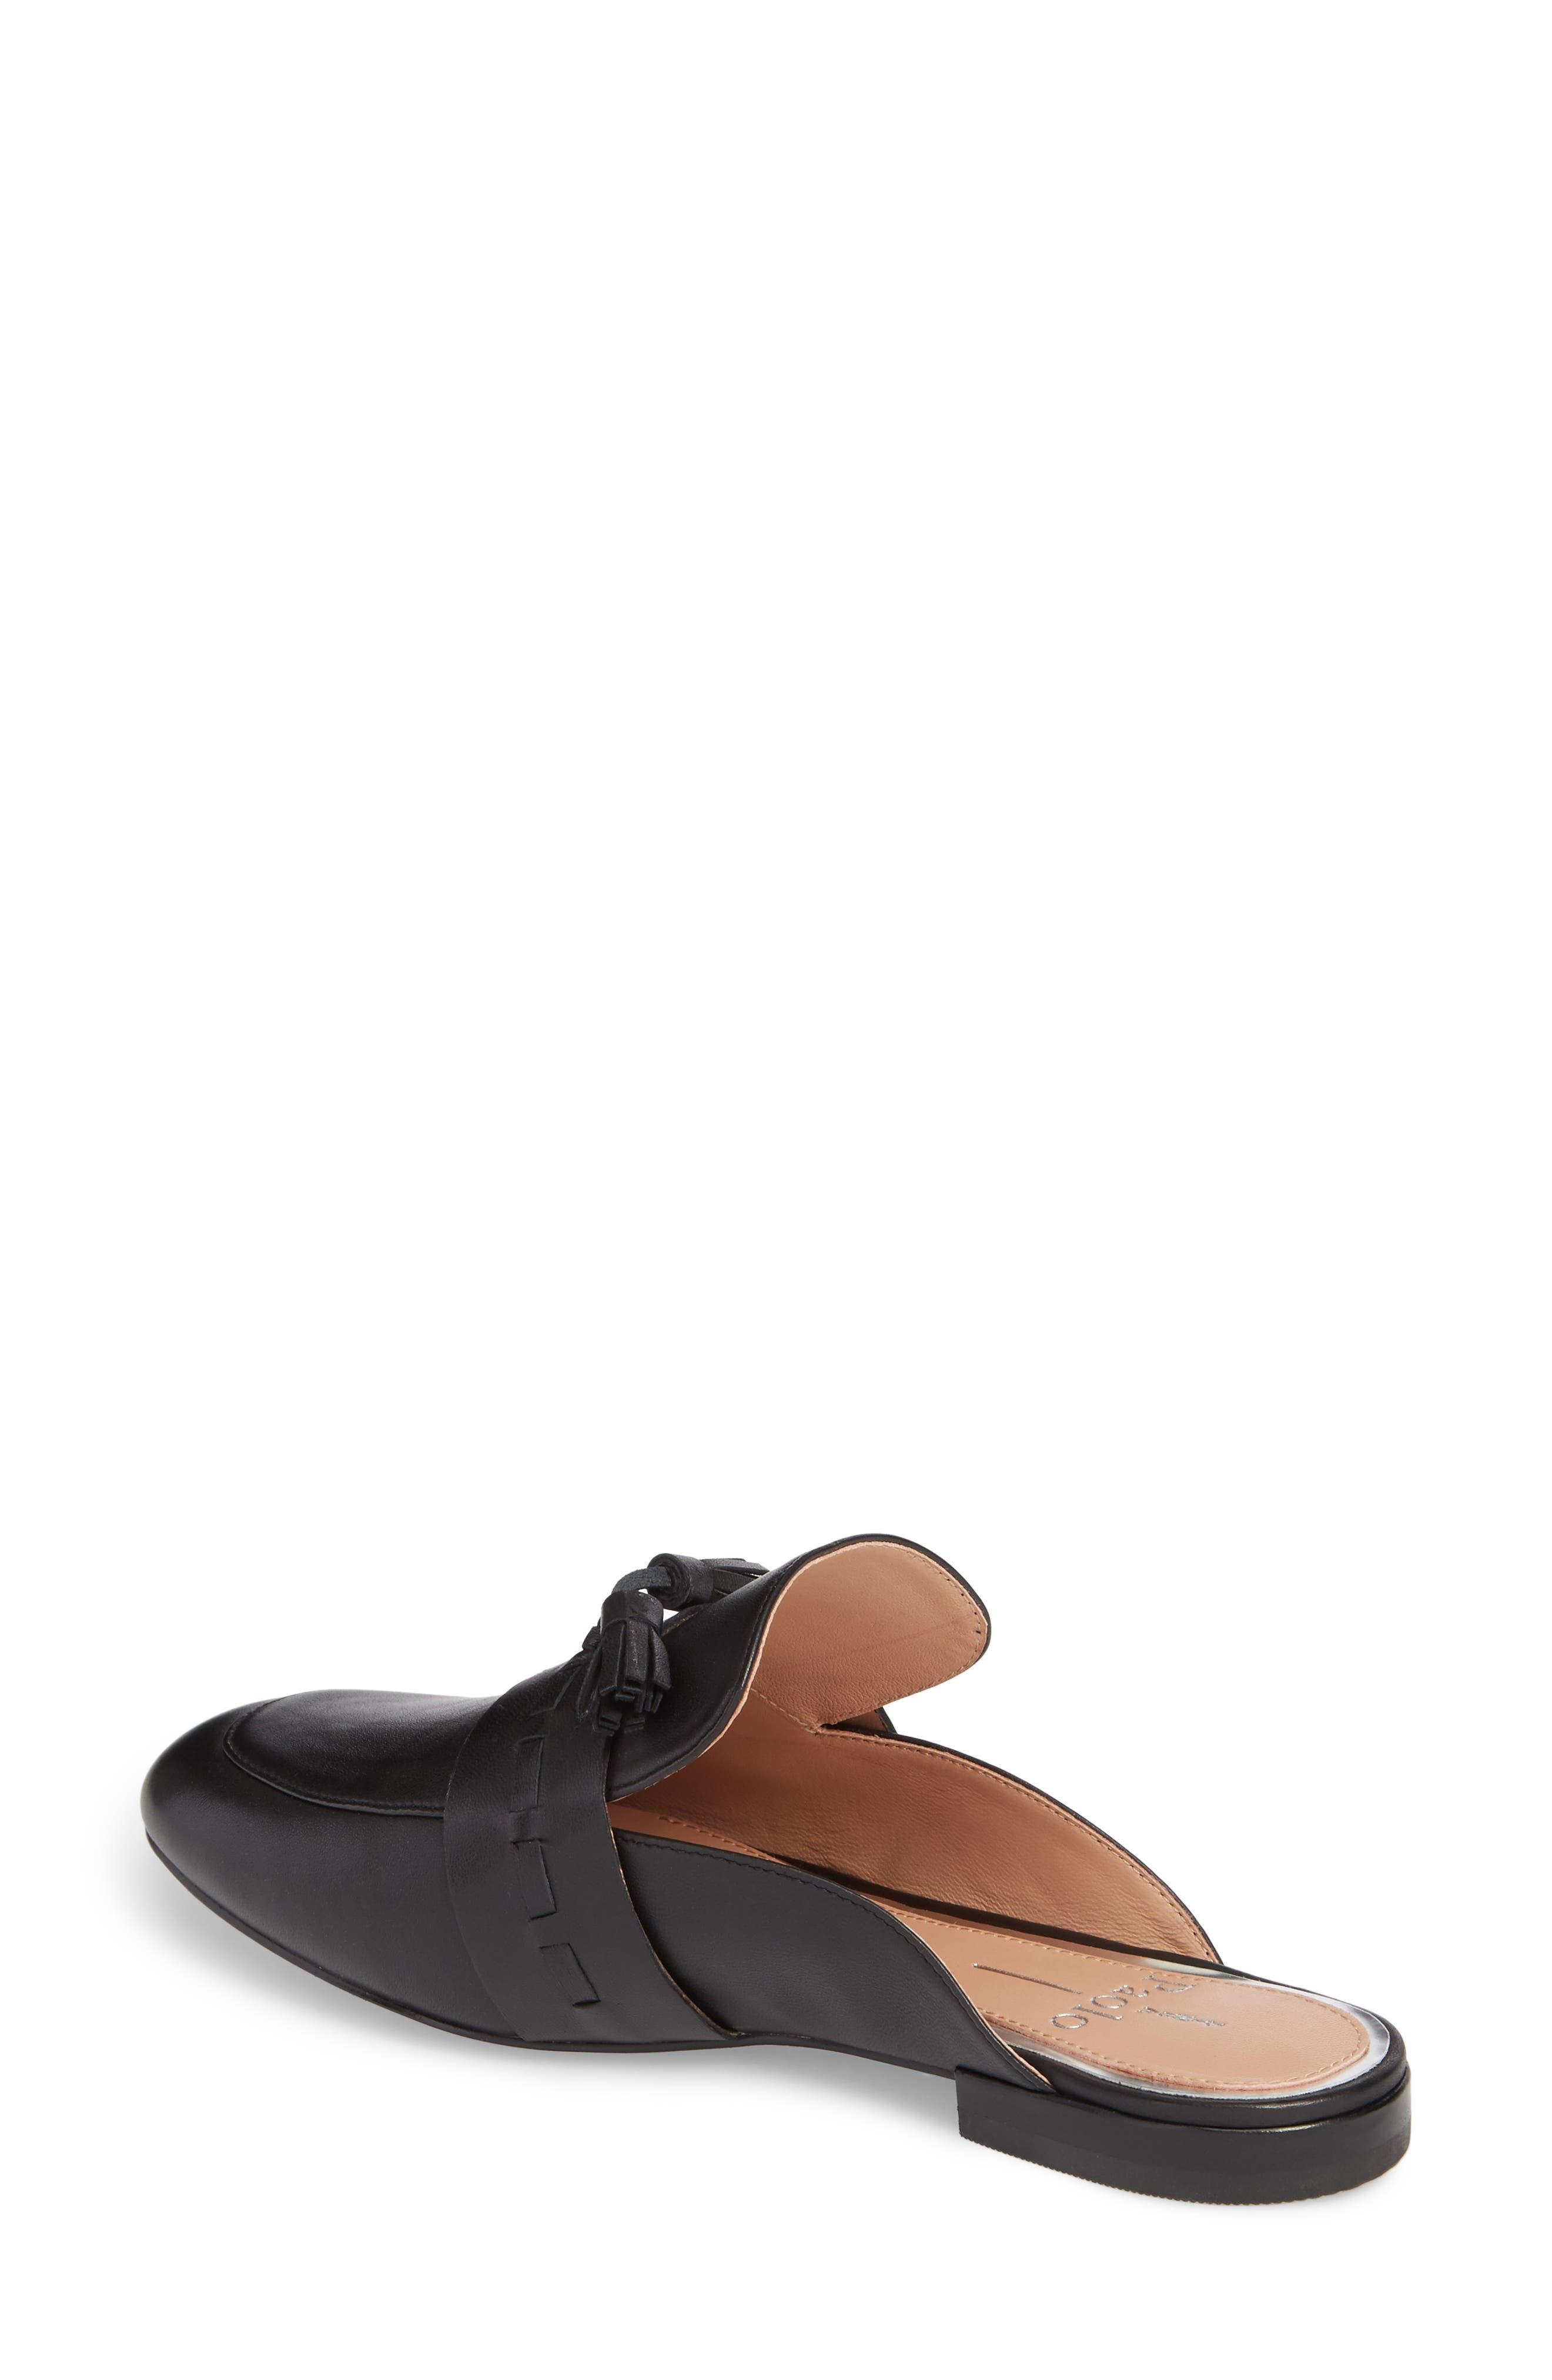 Abbot Tassel Mule,                             Alternate thumbnail 2, color,                             Black Leather